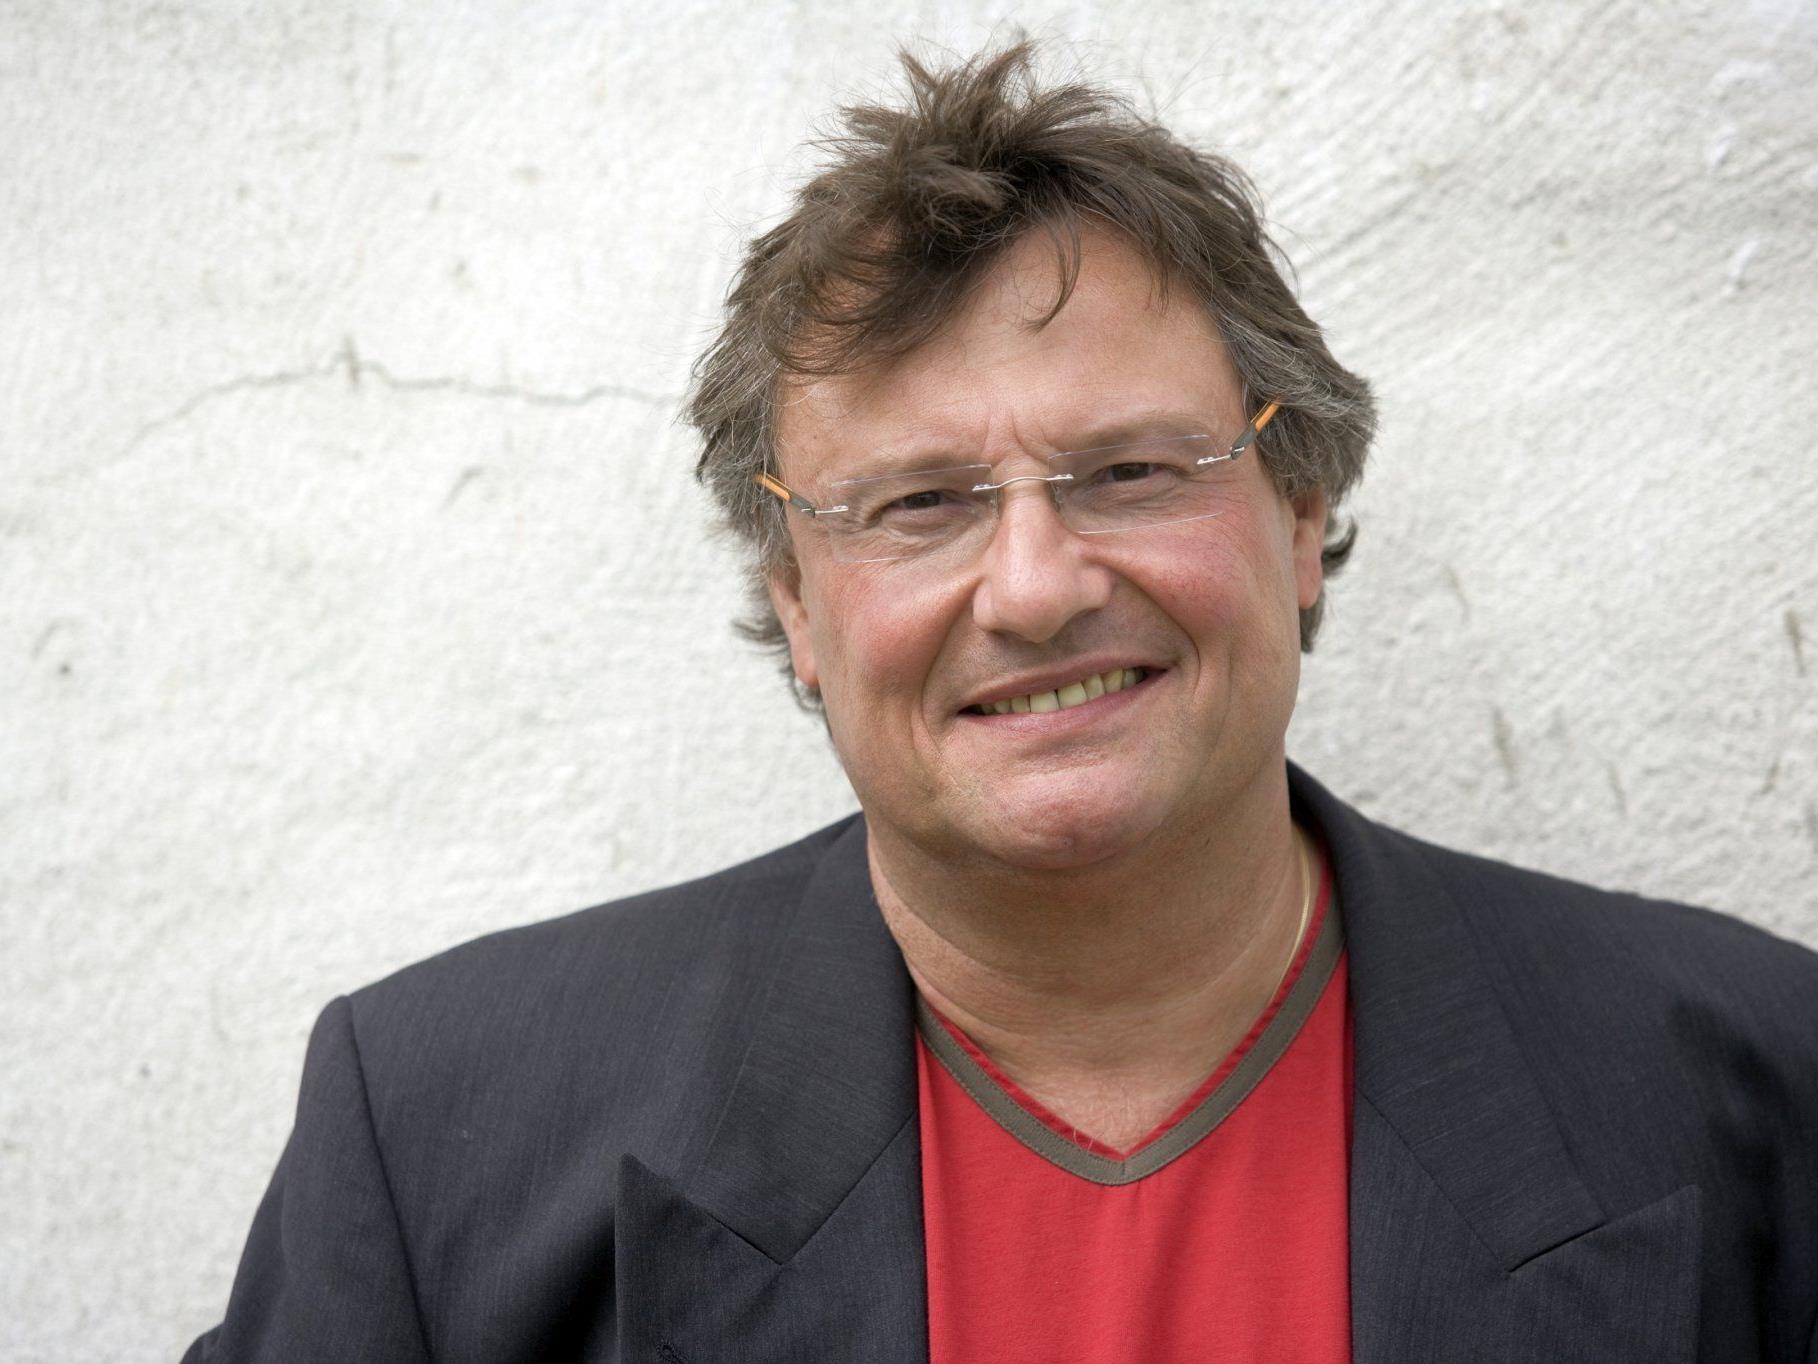 Joesi Prokopetz am 19. März im Hohenemser Löwensaal